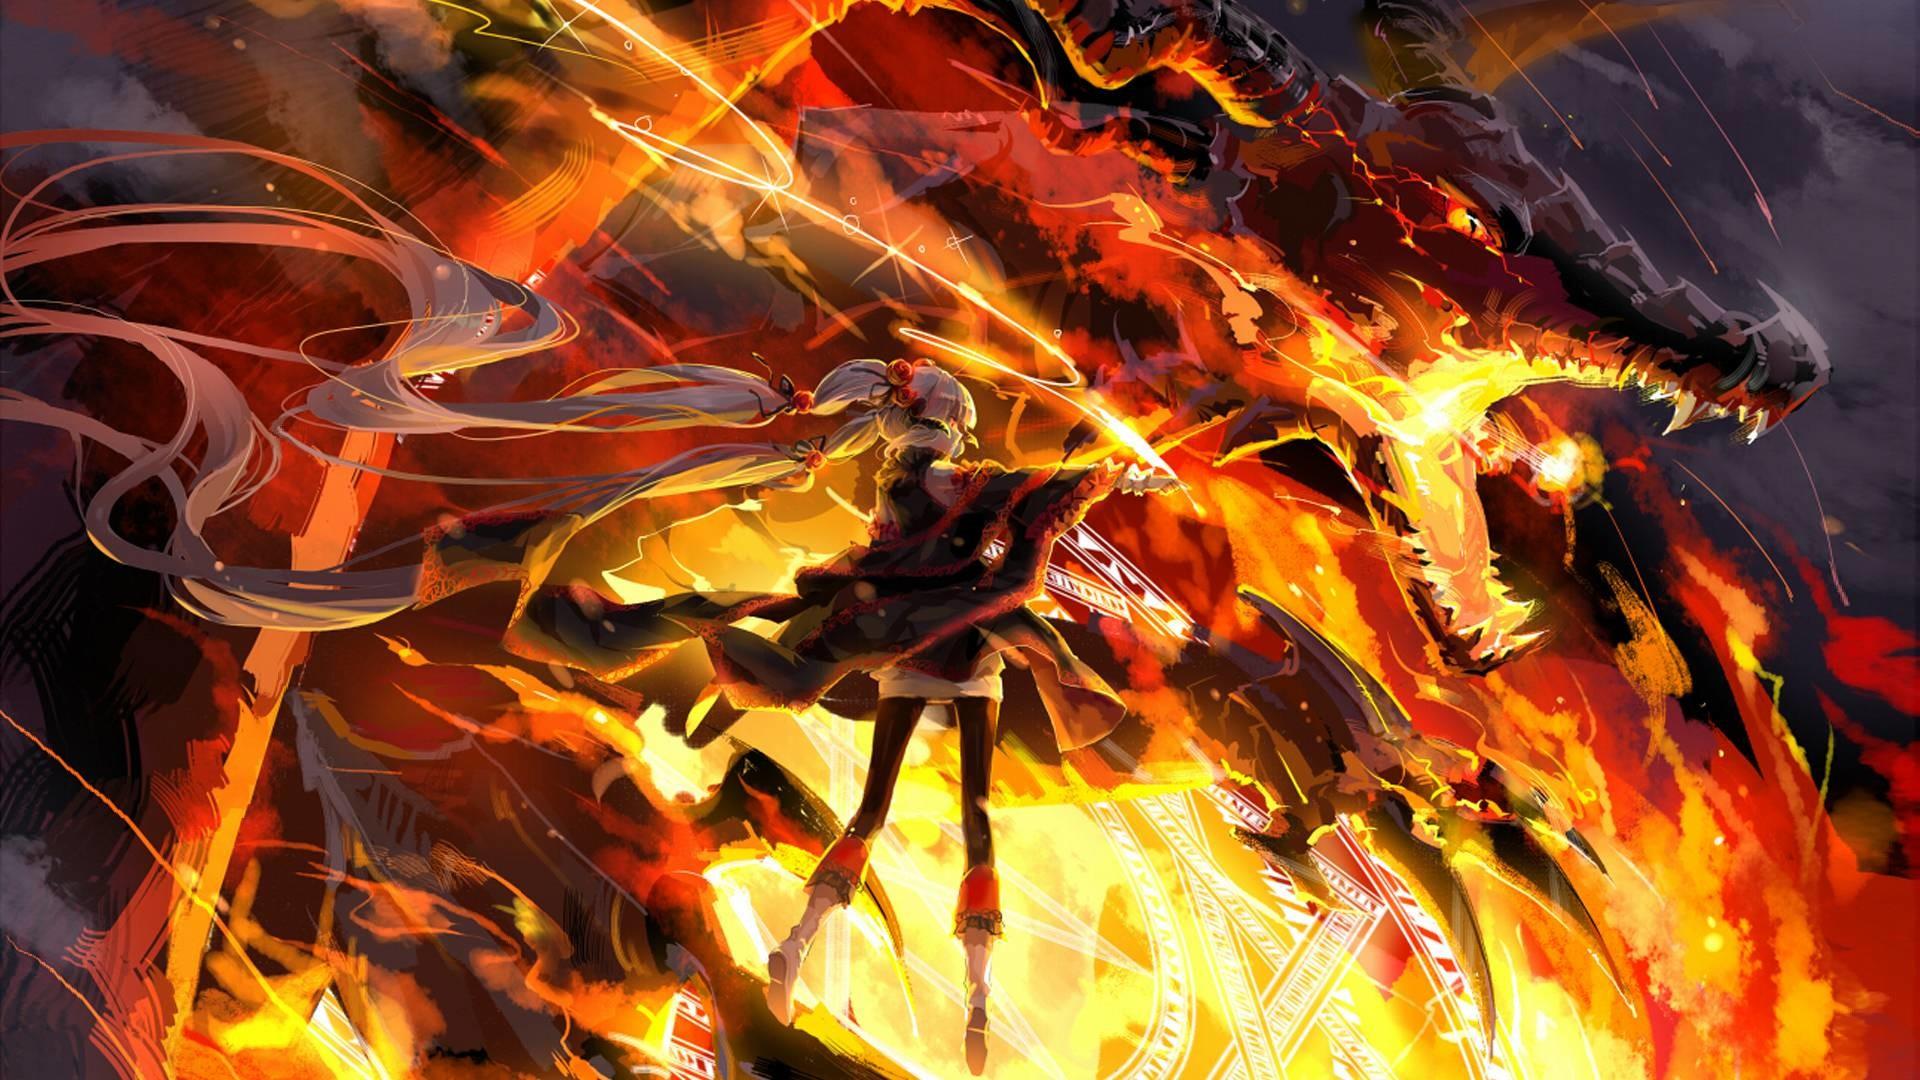 1920x1080 3d Fire Dragon Wallpapers